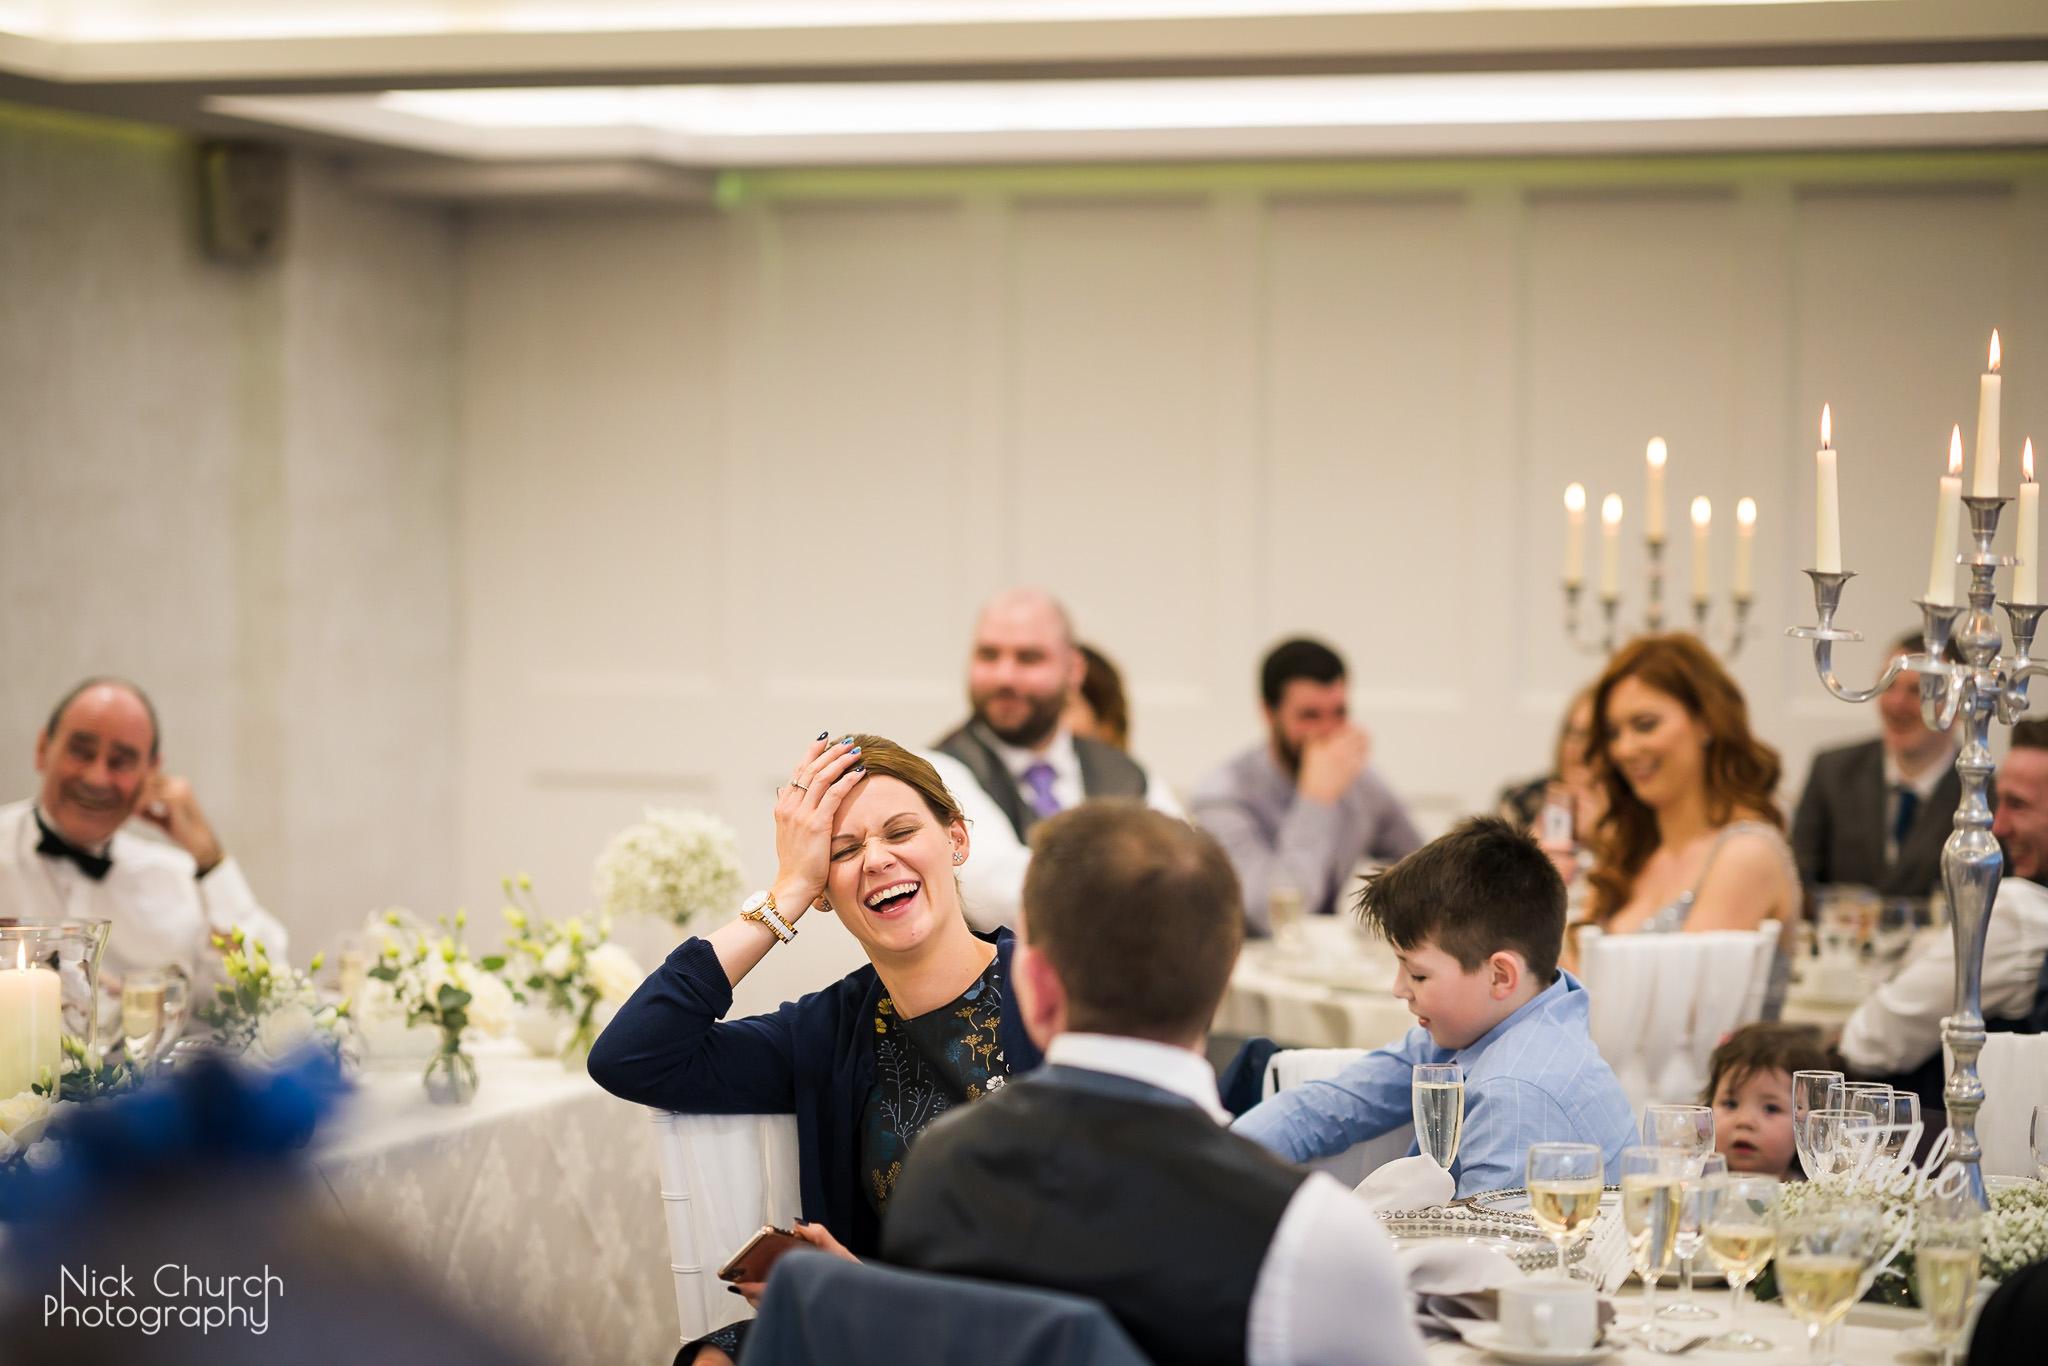 NC-20180317-stacy-and-mike-wedding-1804.jpg